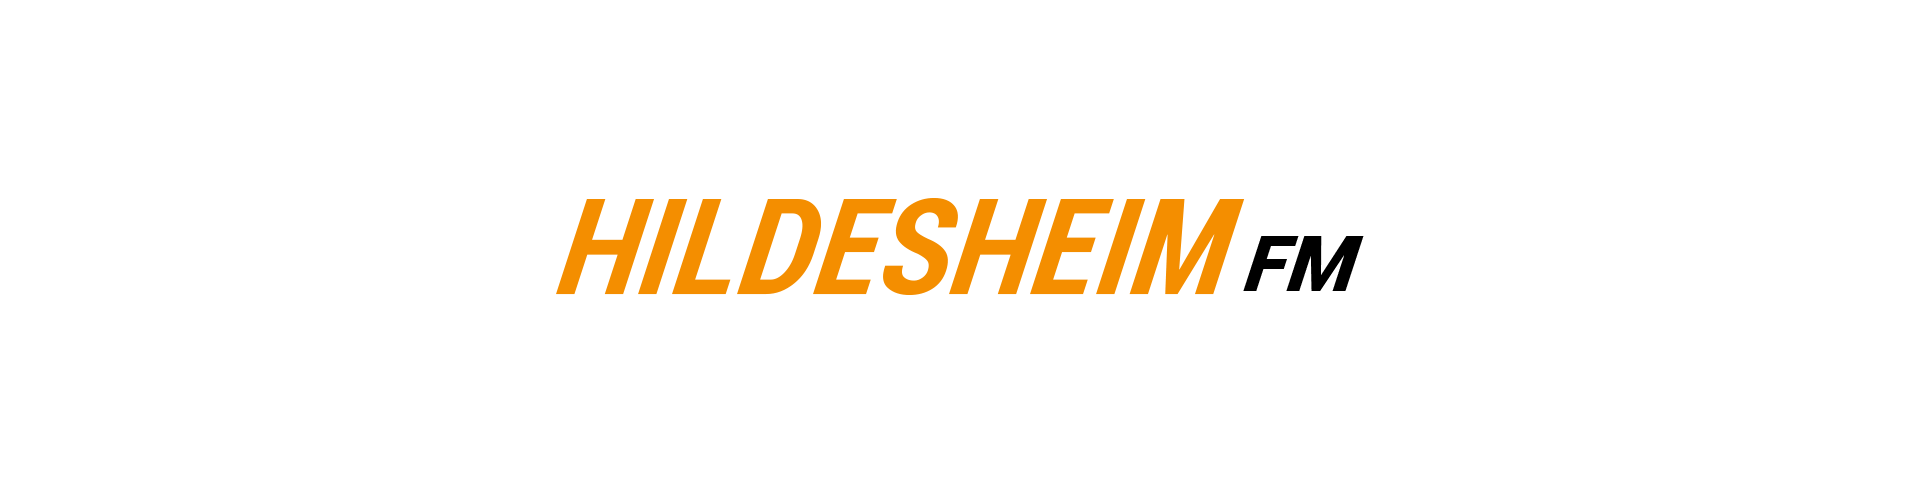 Hildesheim FM